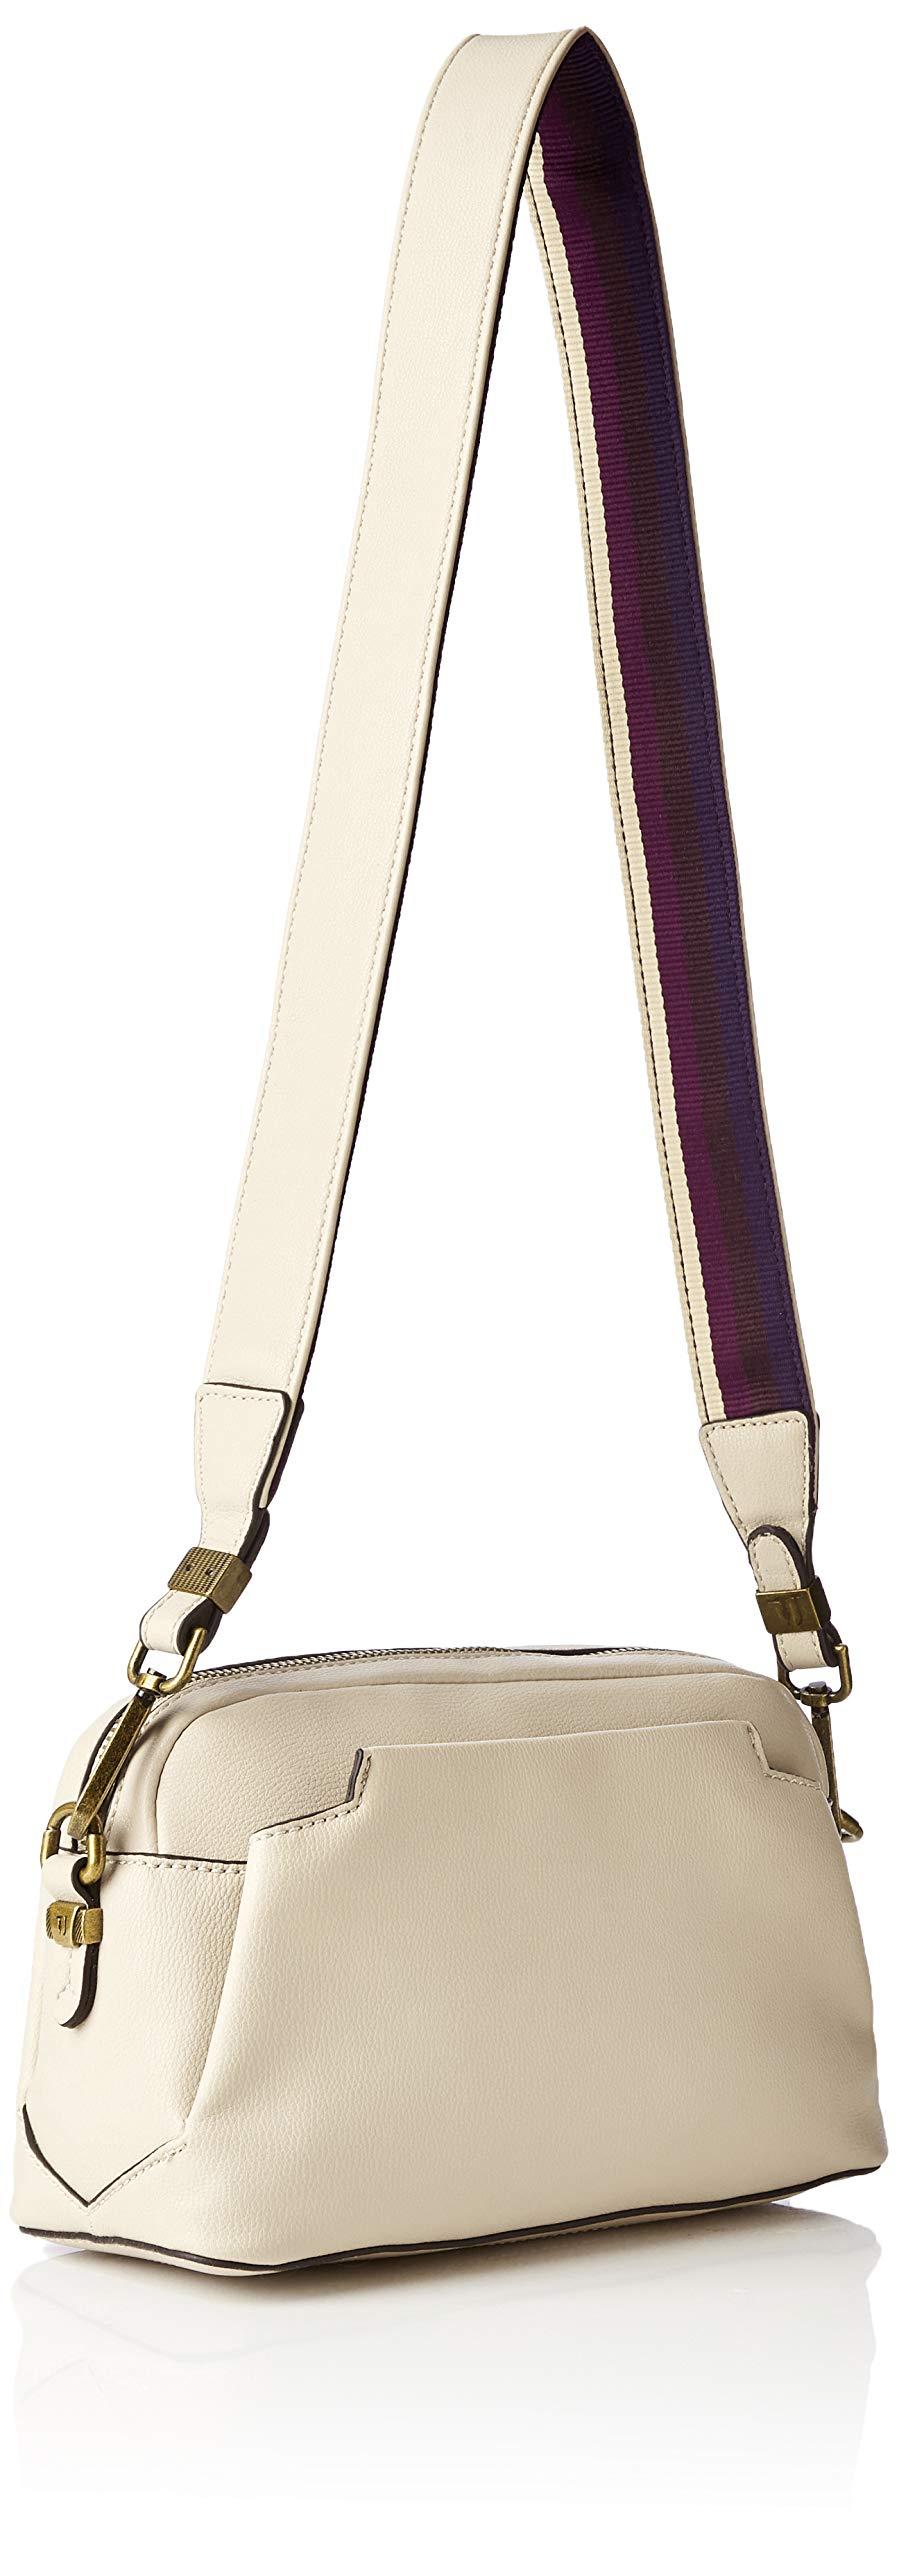 Trussardi Jeans Rabarbaro Shoulder Bag, Borsa a Tracolla